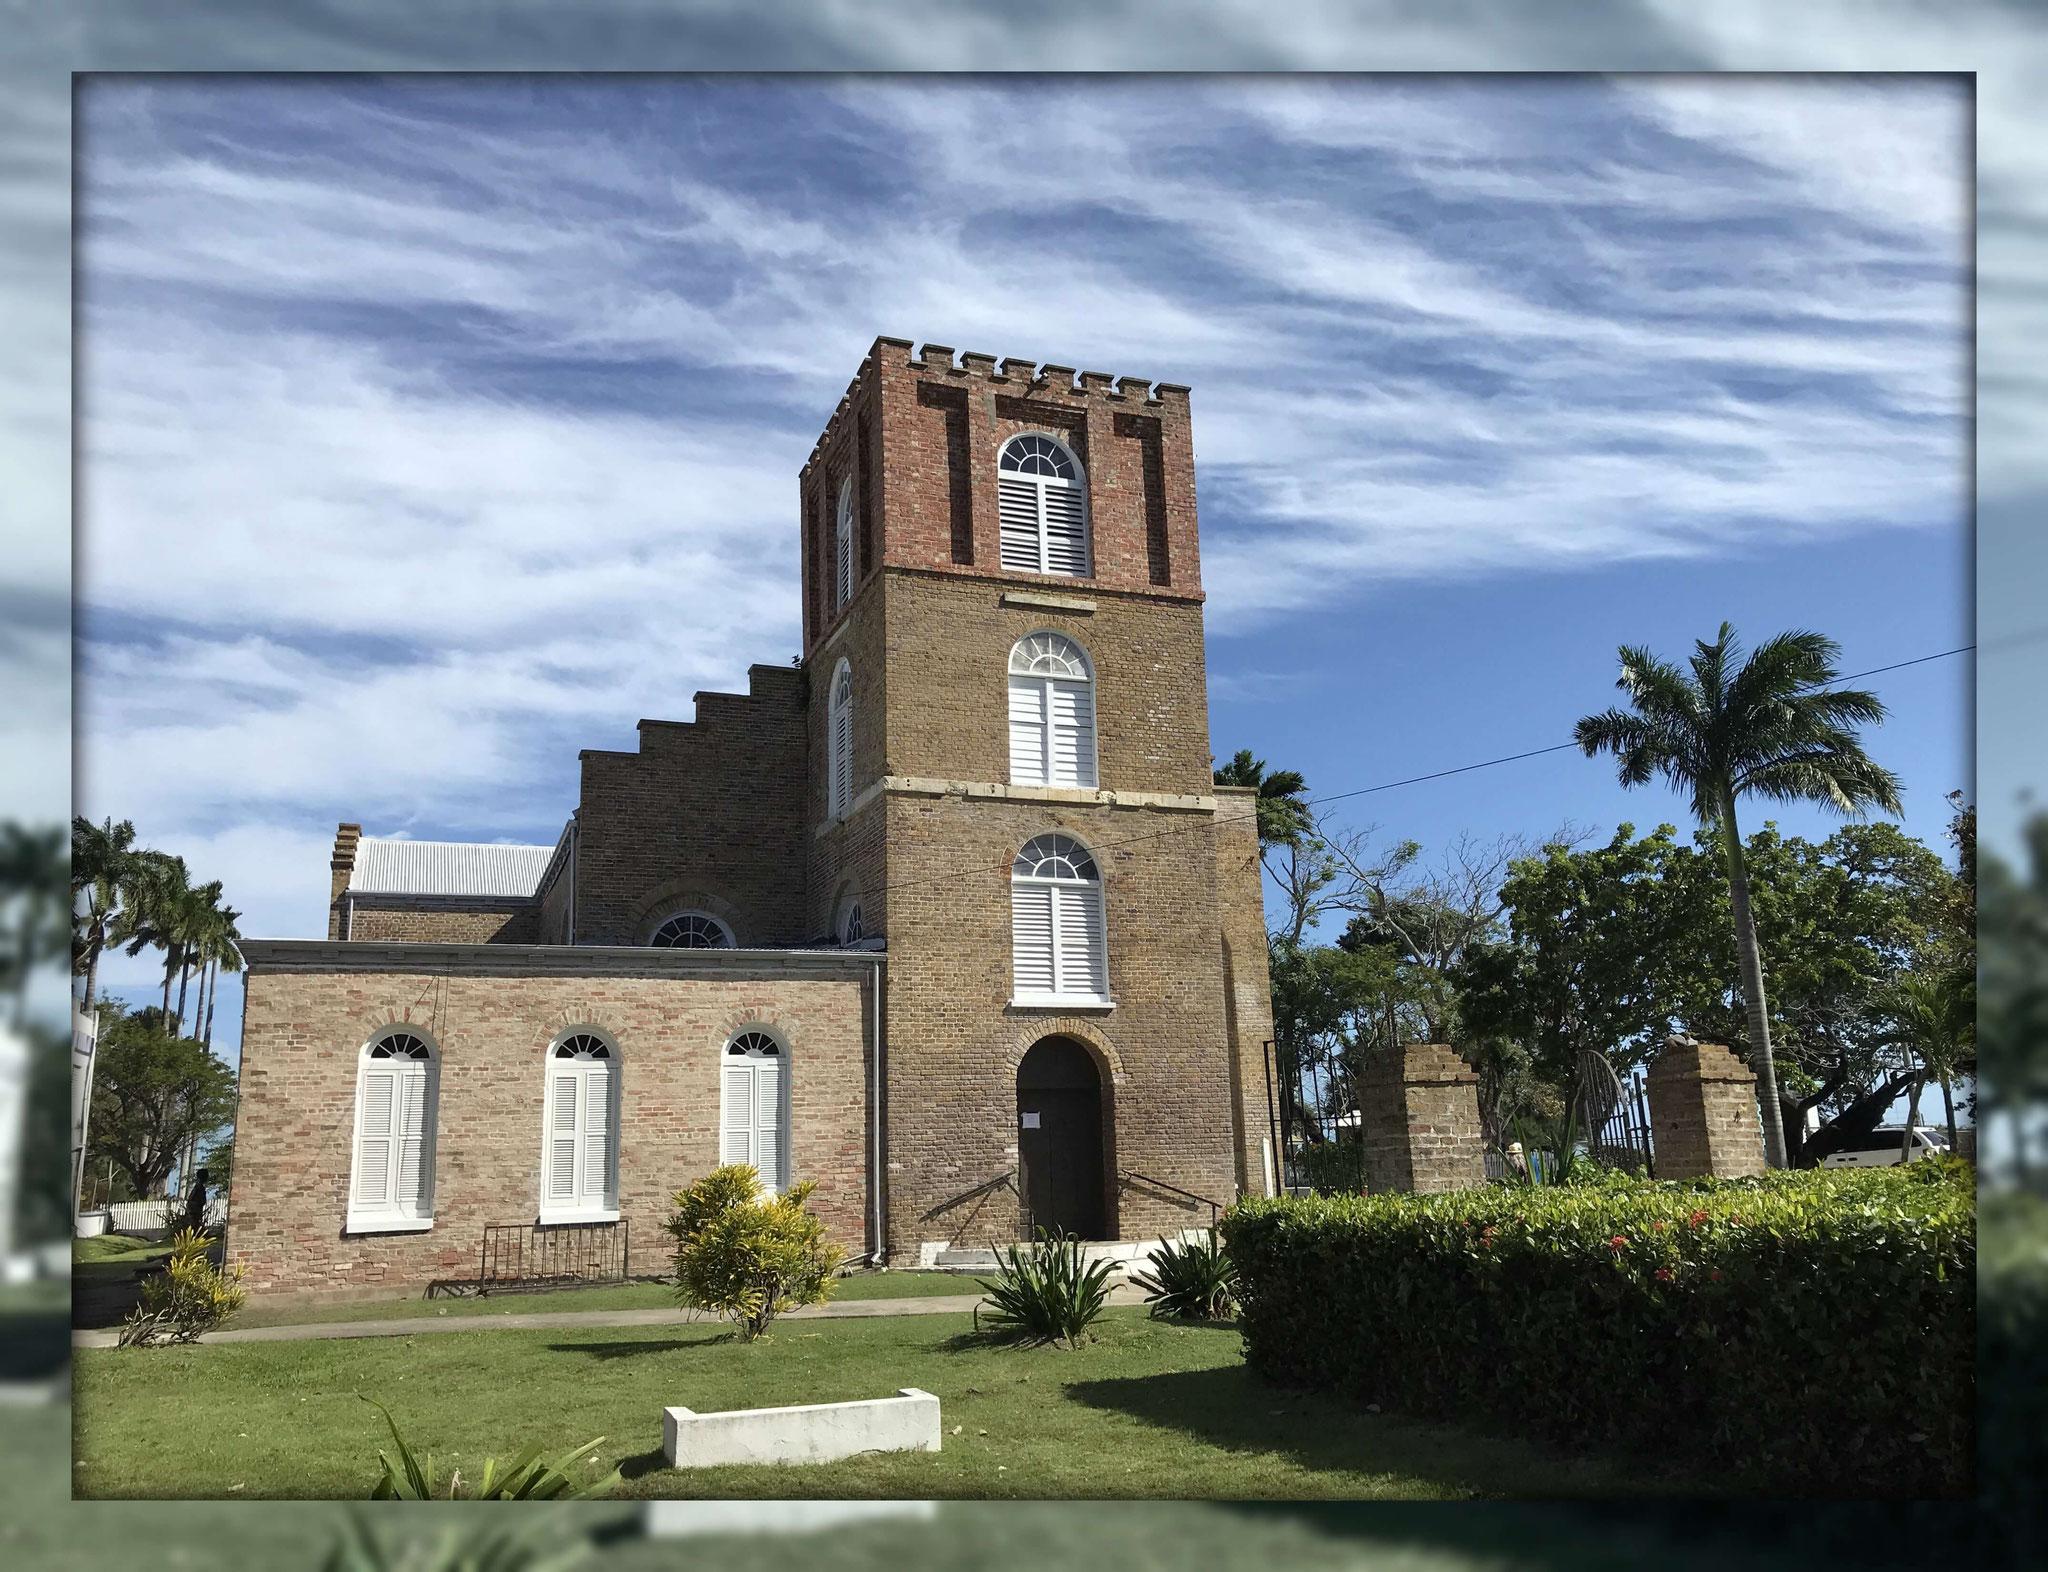 St. John's Cathedral - die älteste Kathedrale in Zentralamerika (1812)